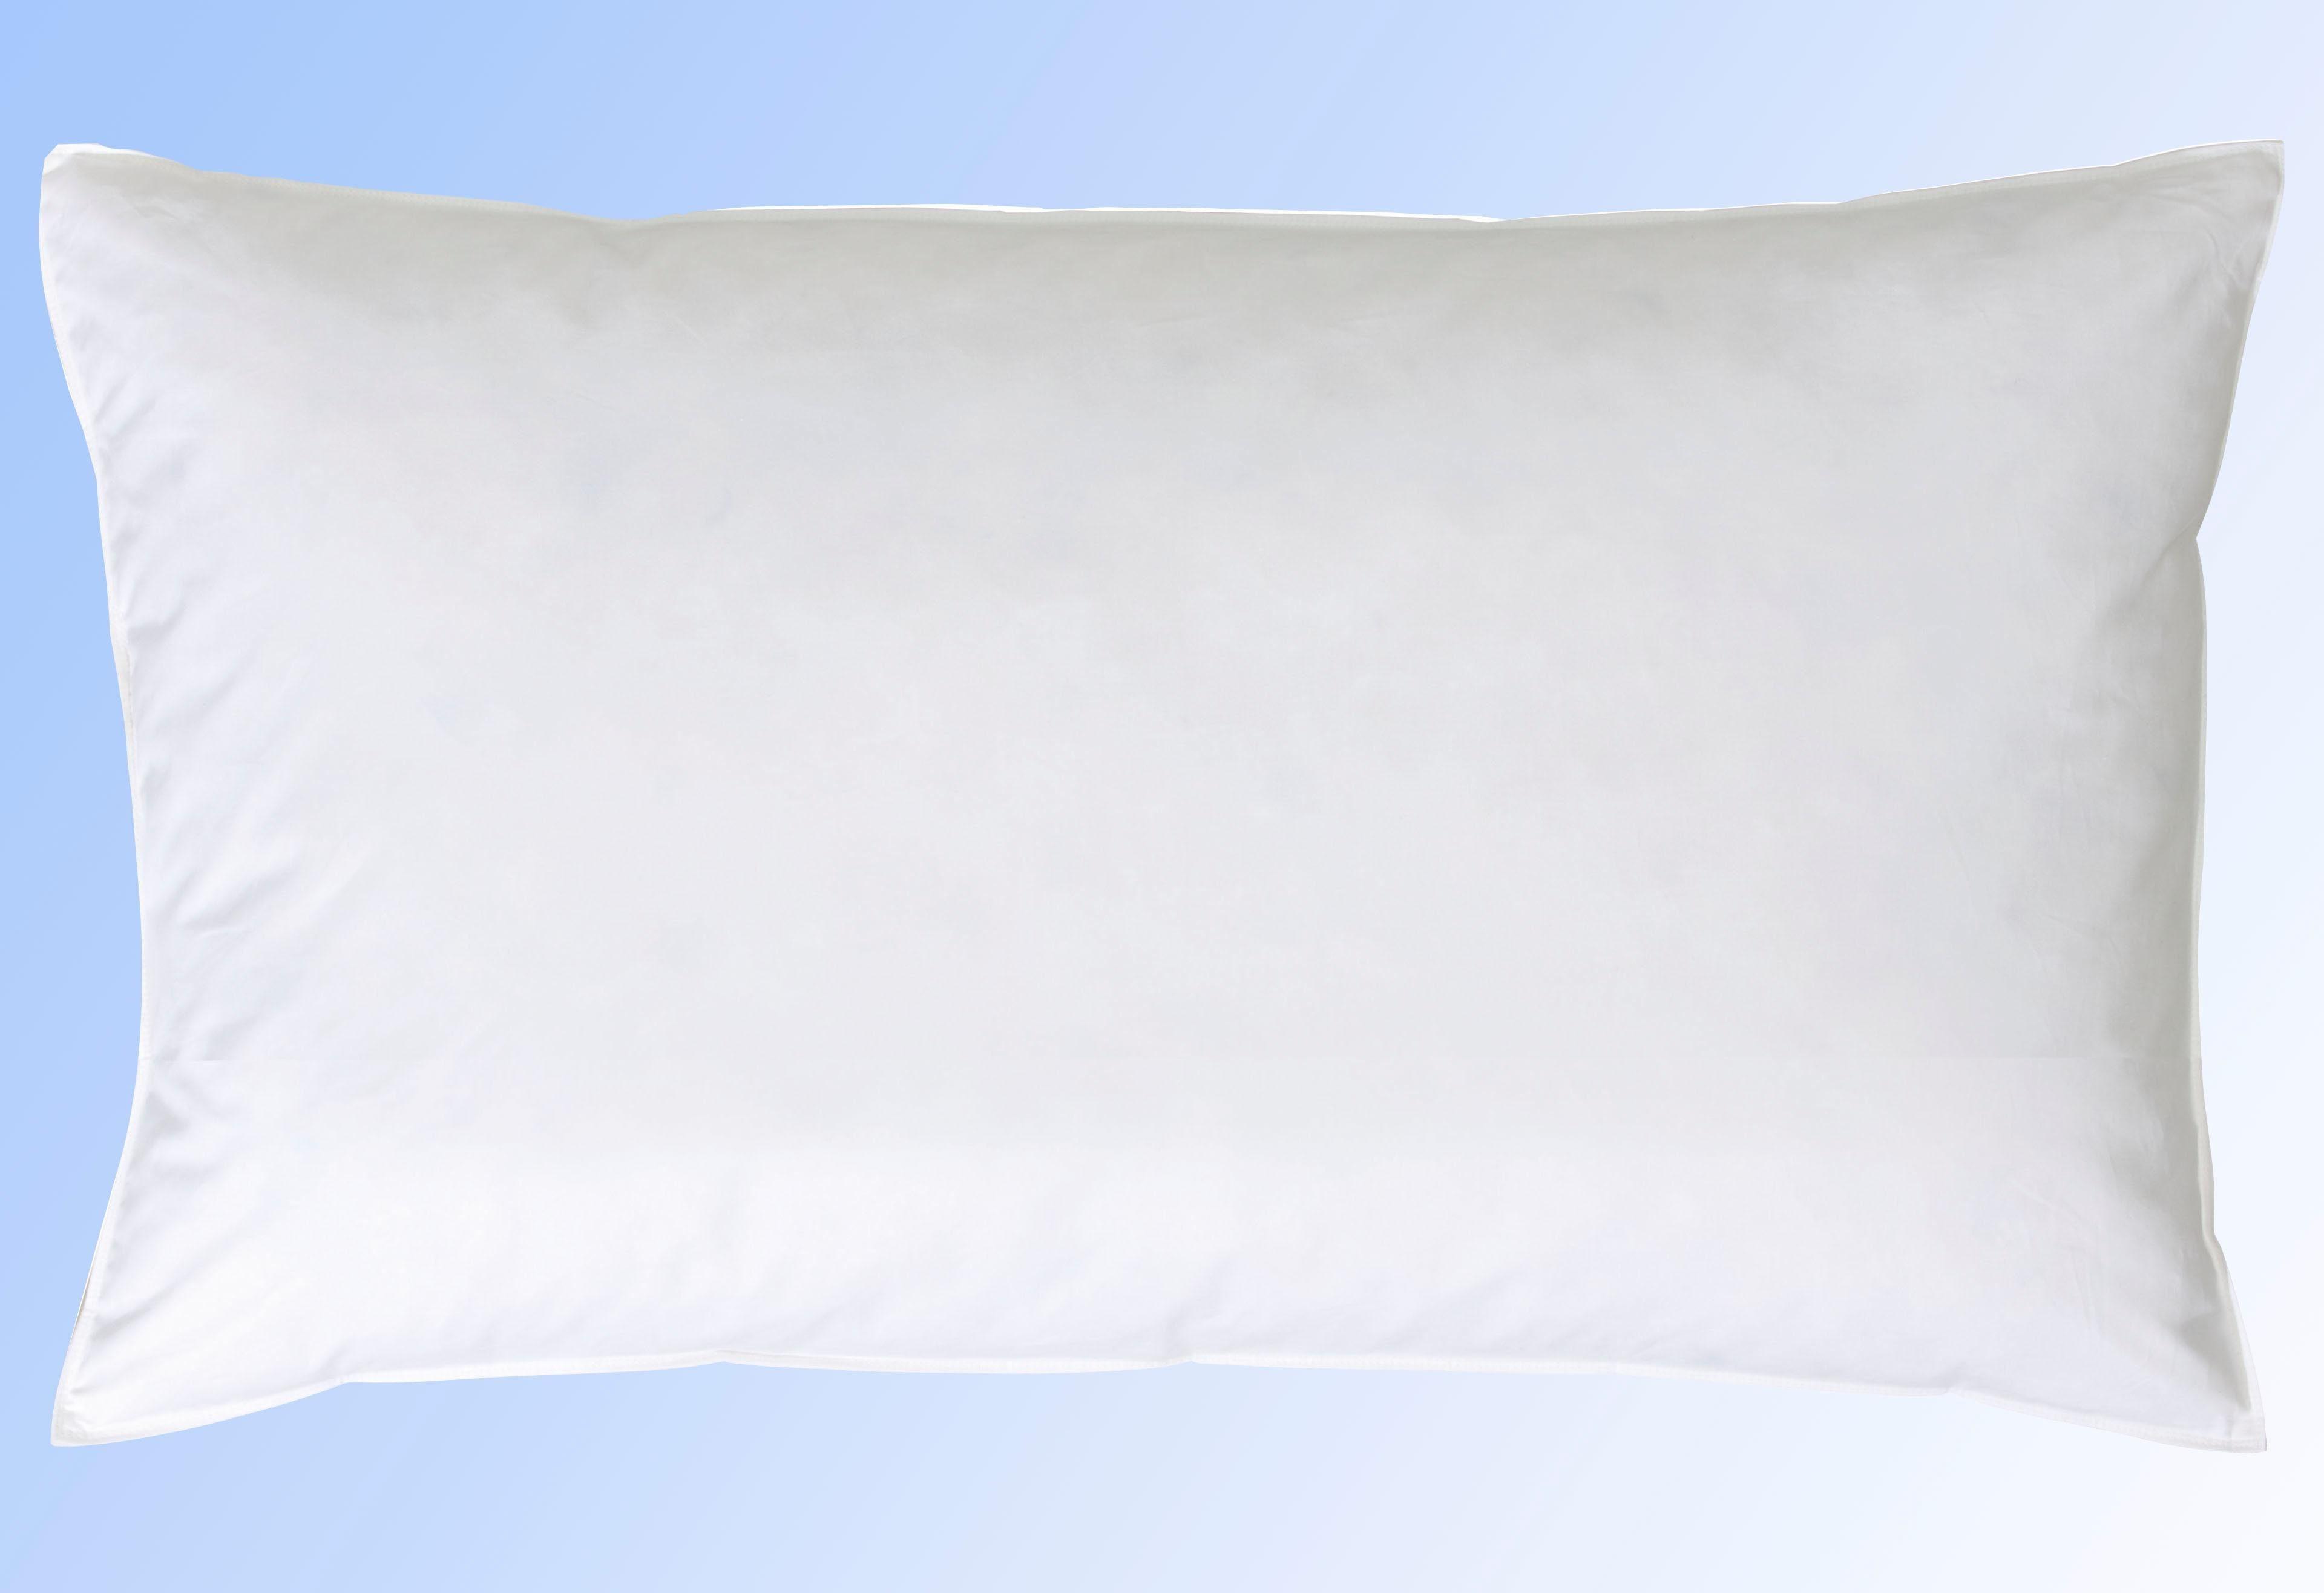 Federkissen, »Kopfkissen Classic / Kopfkissen Soft«, Centa-Star, (1-tlg), 50% Gänsefedern, 50% Gänsedaunen, 40x80 cm